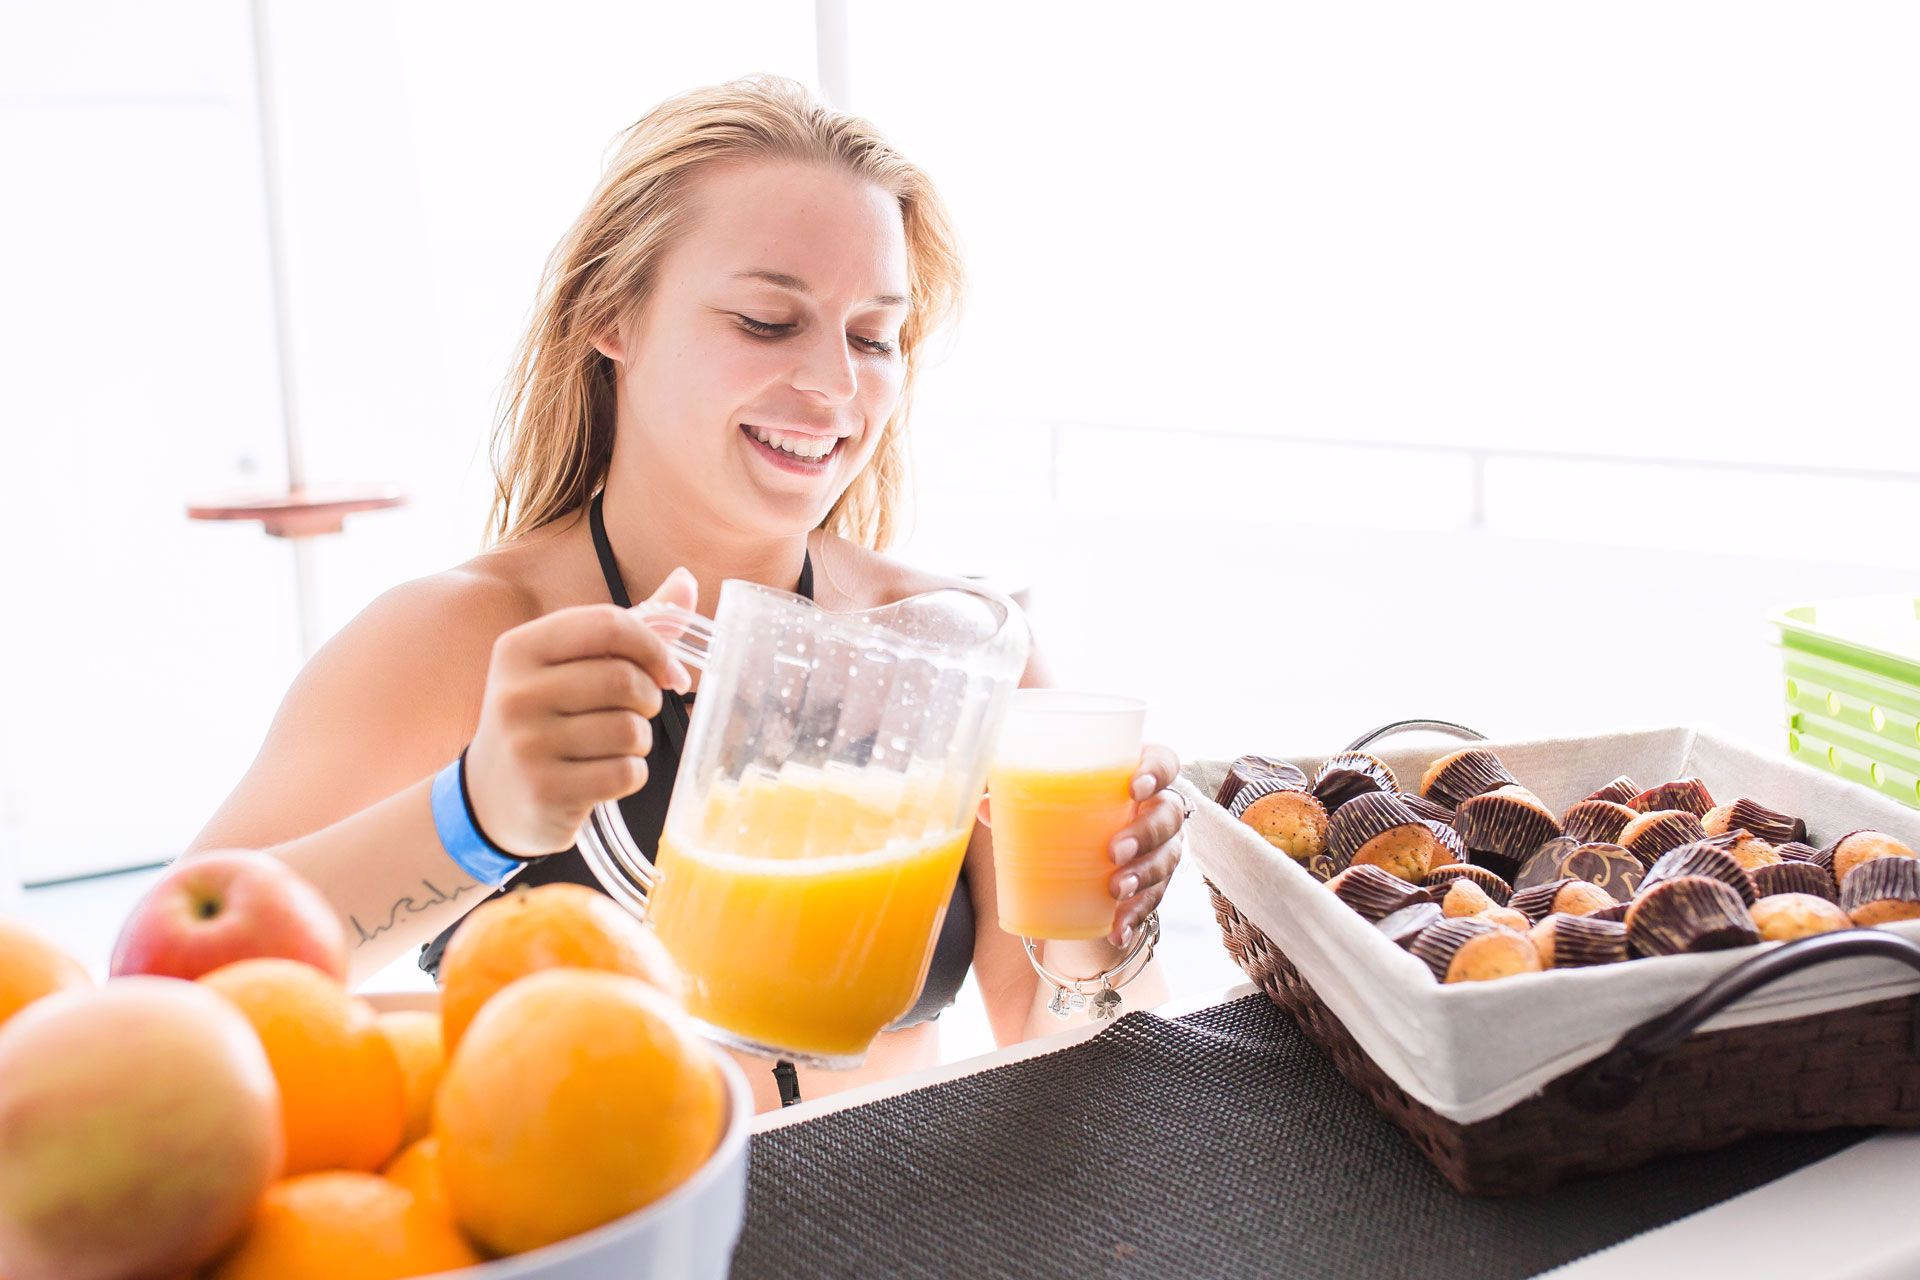 Enjoy a complimentary light breakfast